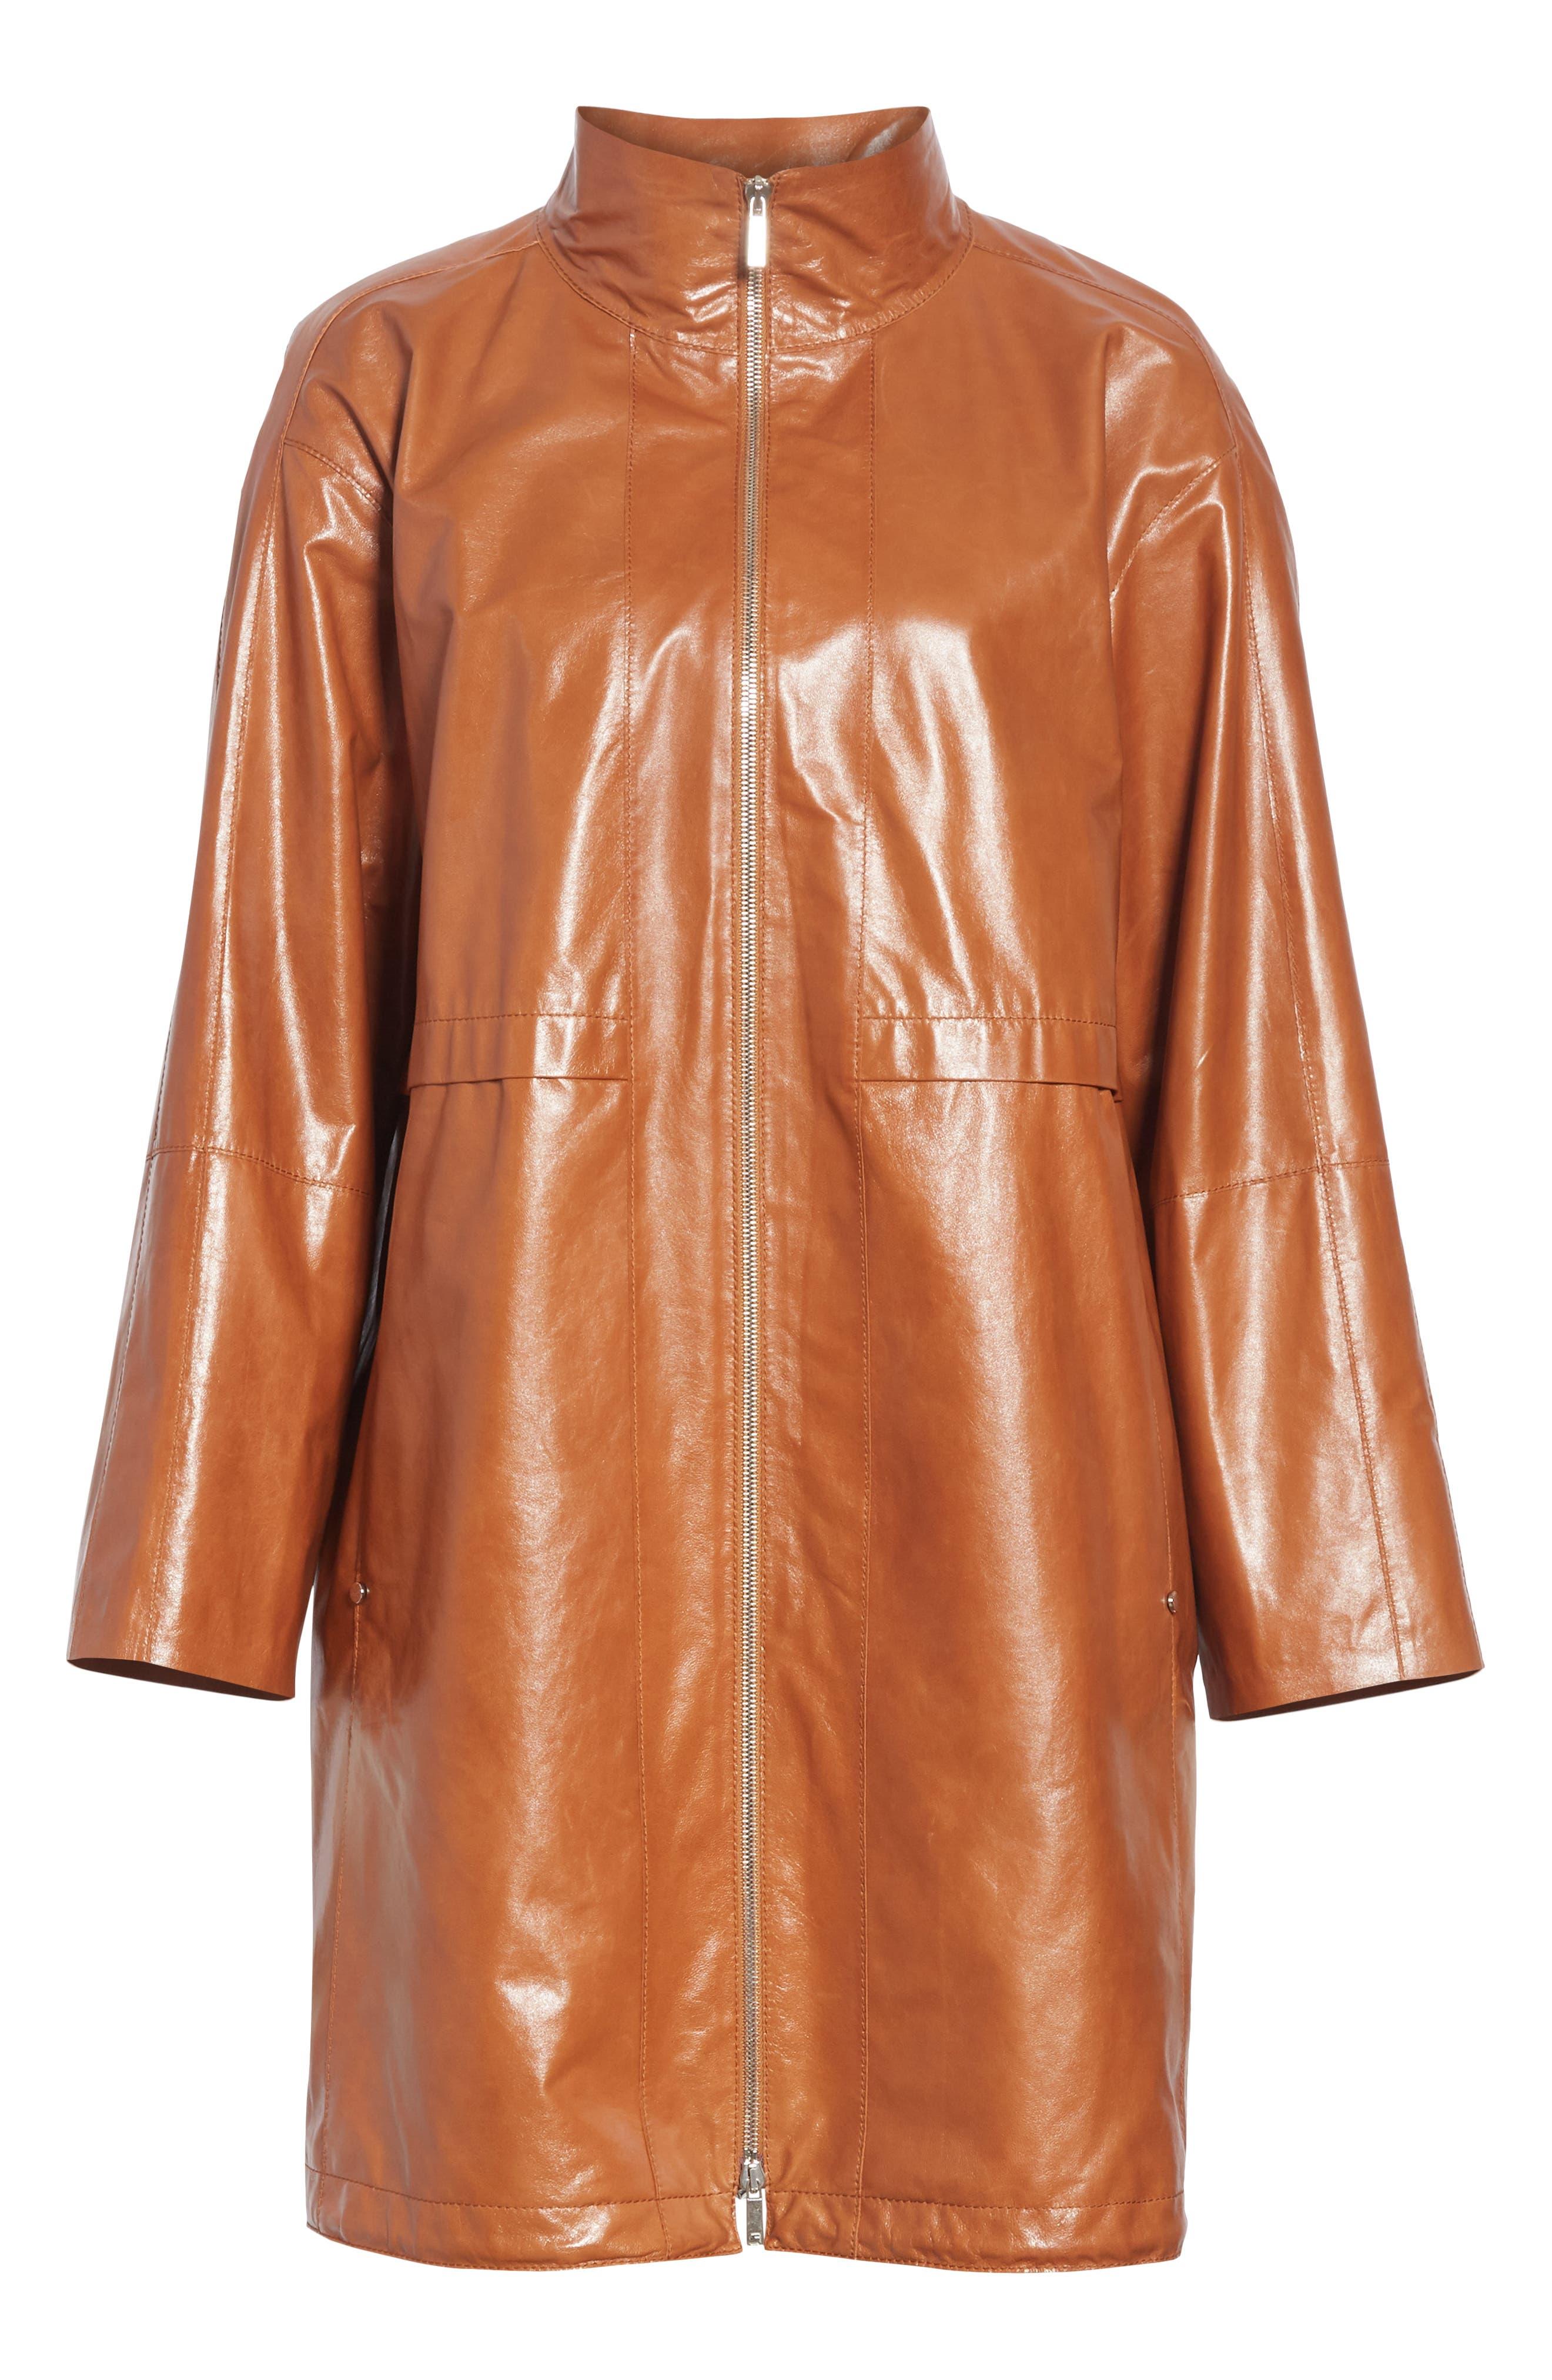 Minerva Leather Jacket,                             Alternate thumbnail 6, color,                             OCHRE